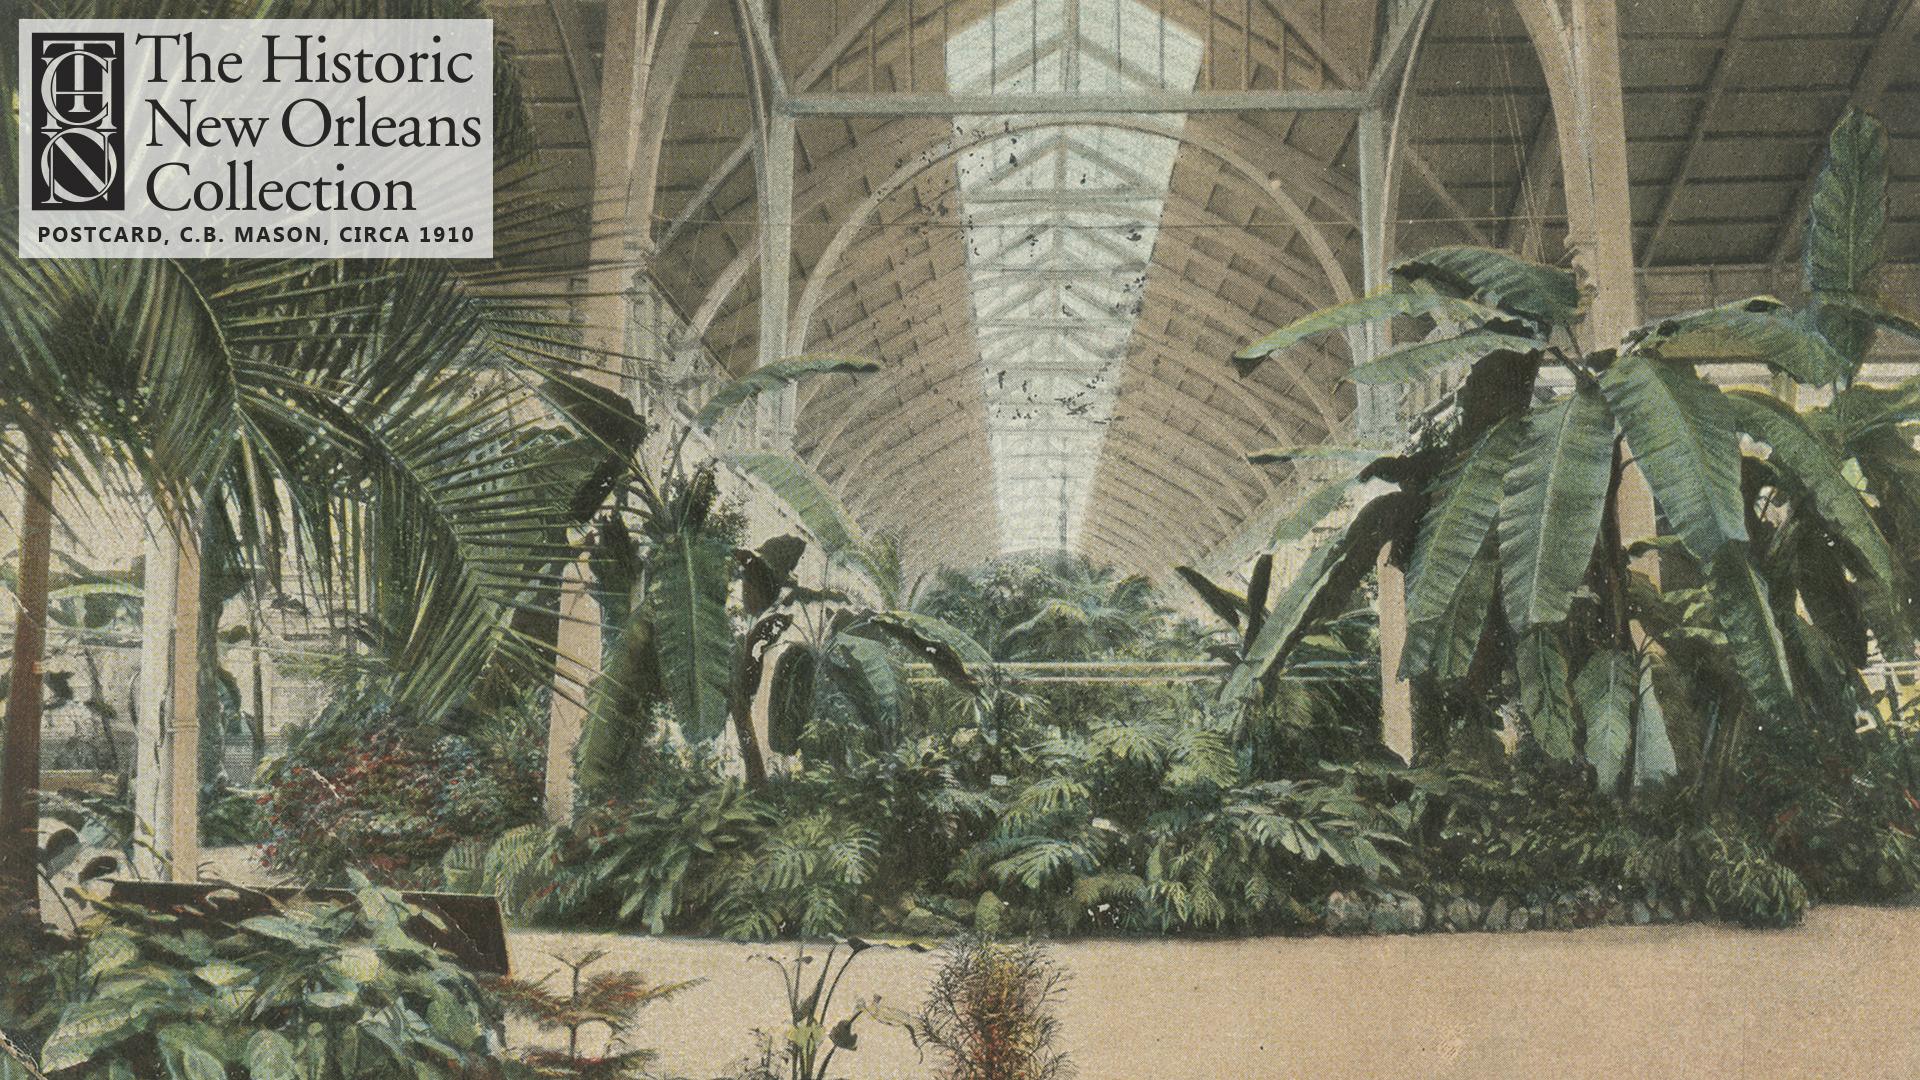 Interior of Horticulture Hall, Audubon Park